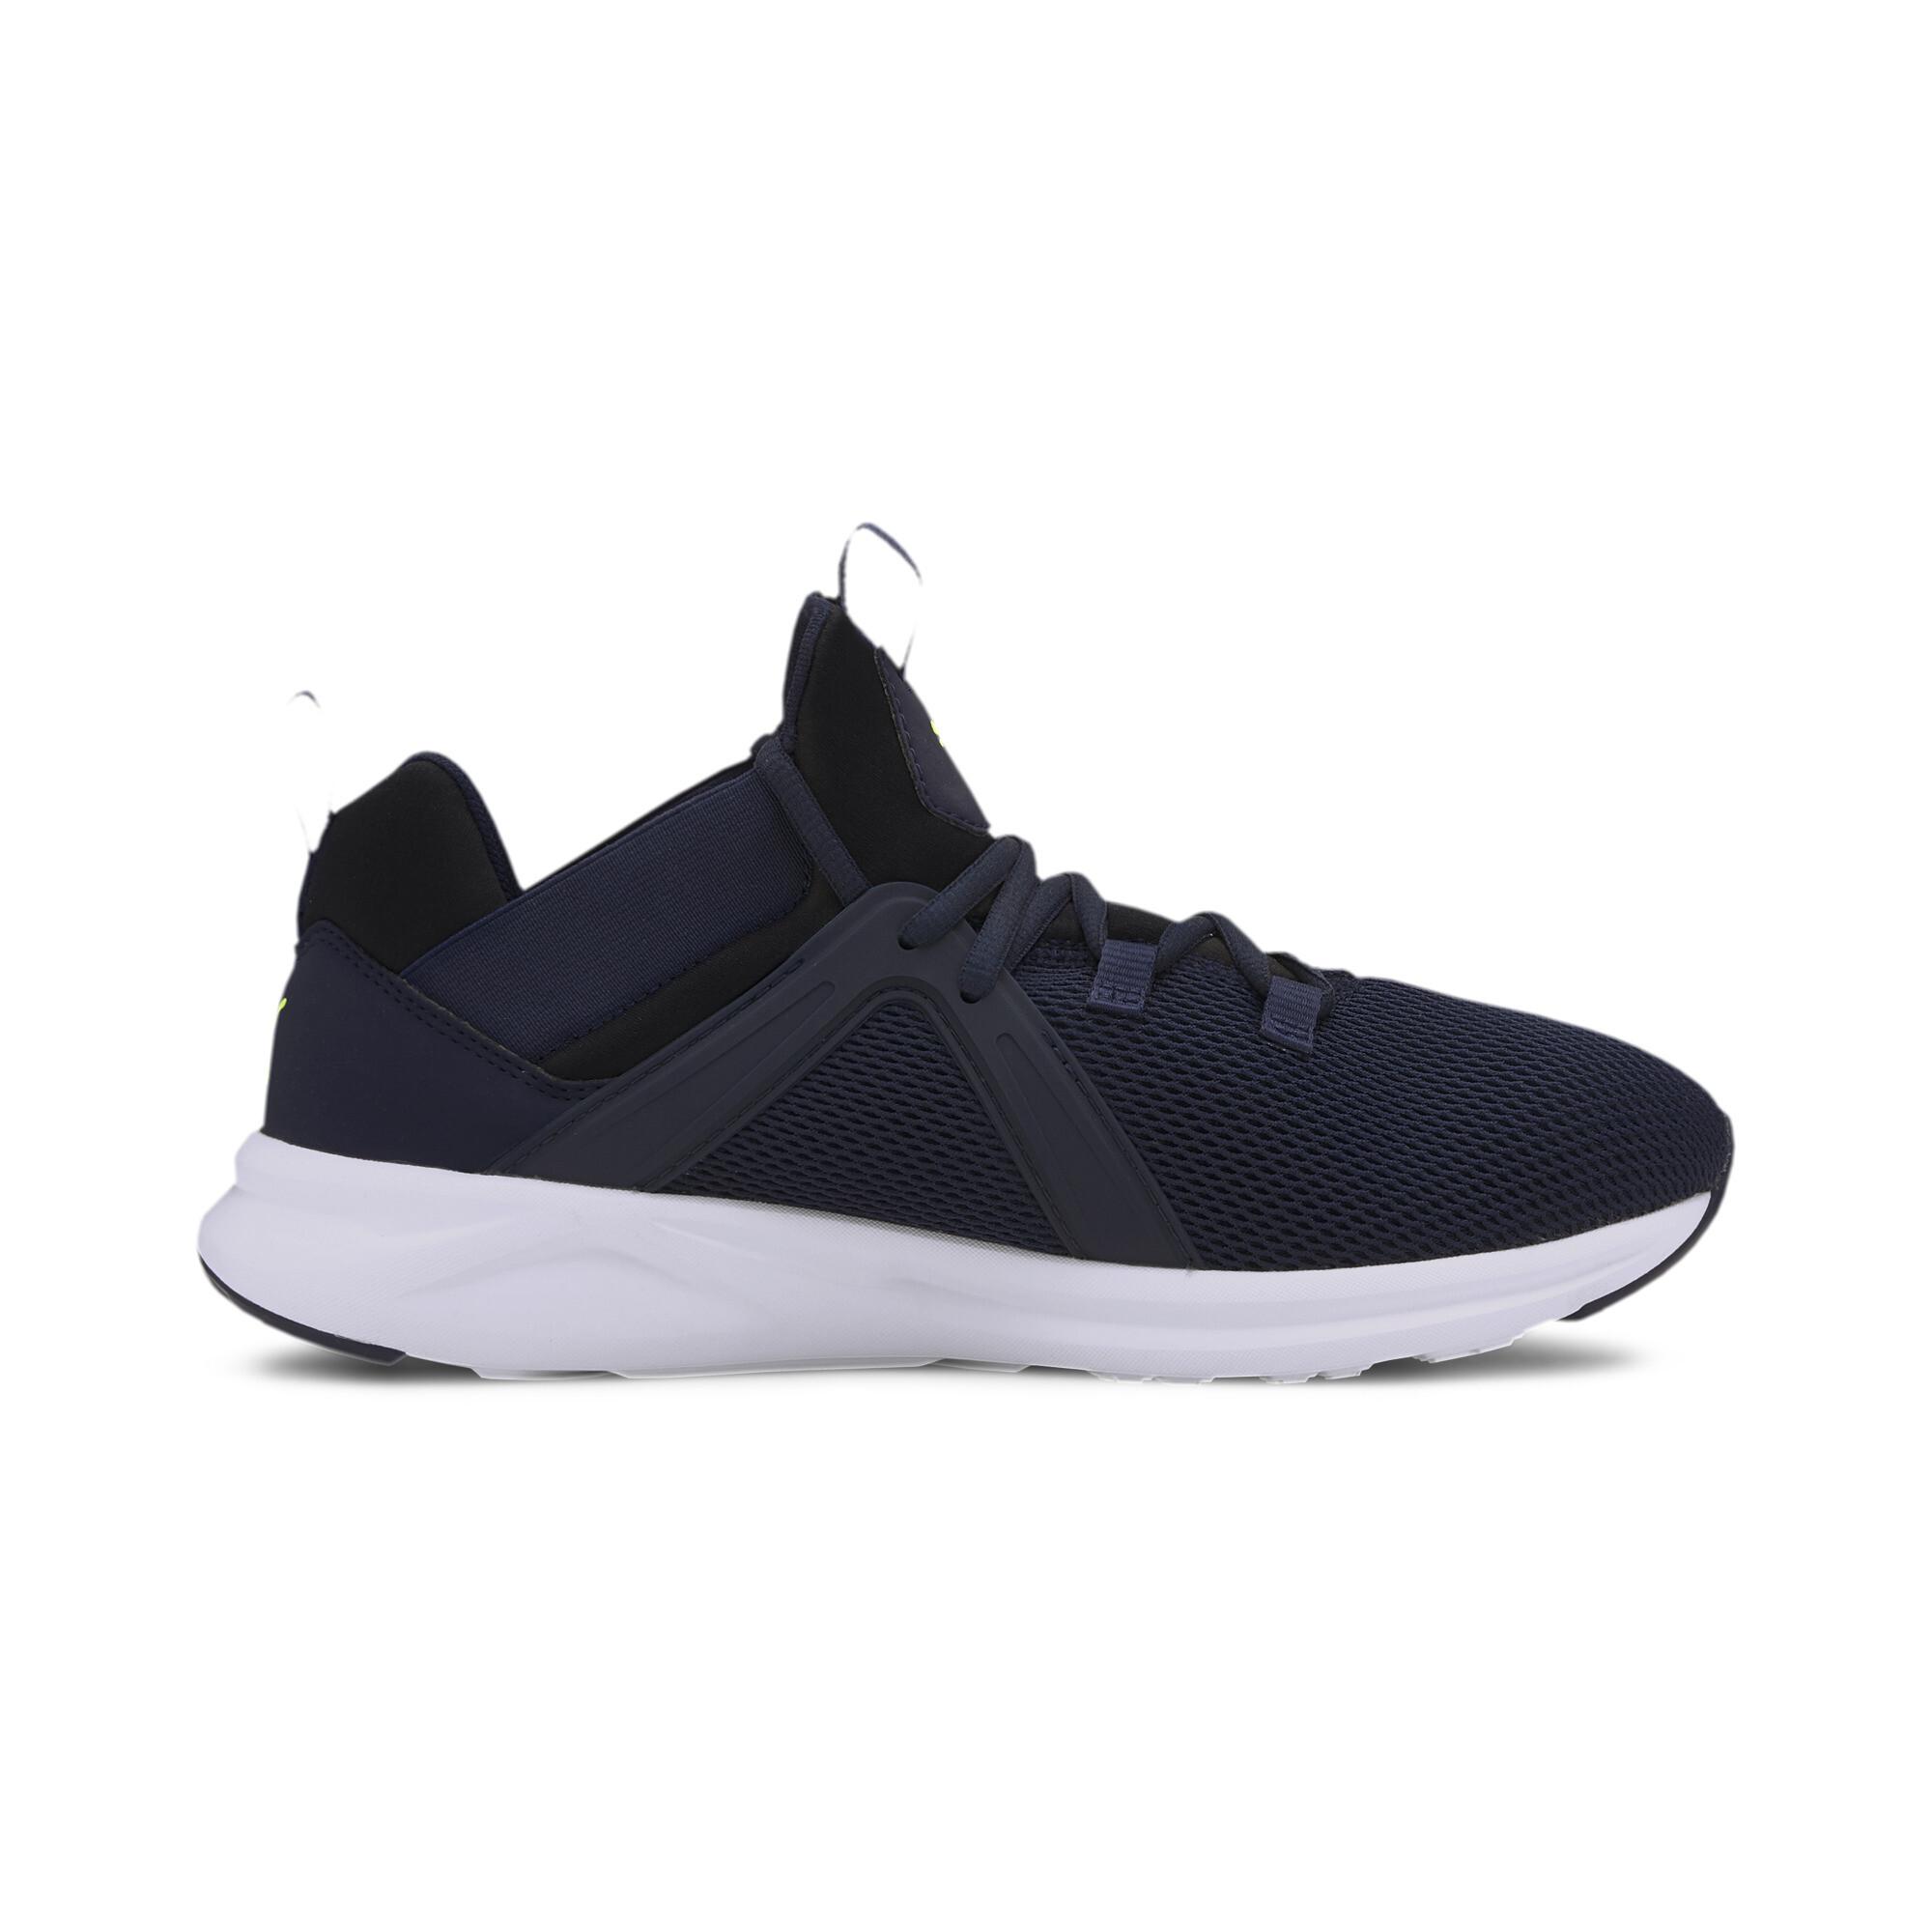 PUMA-Men-039-s-Enzo-2-Wide-Training-Shoes thumbnail 14